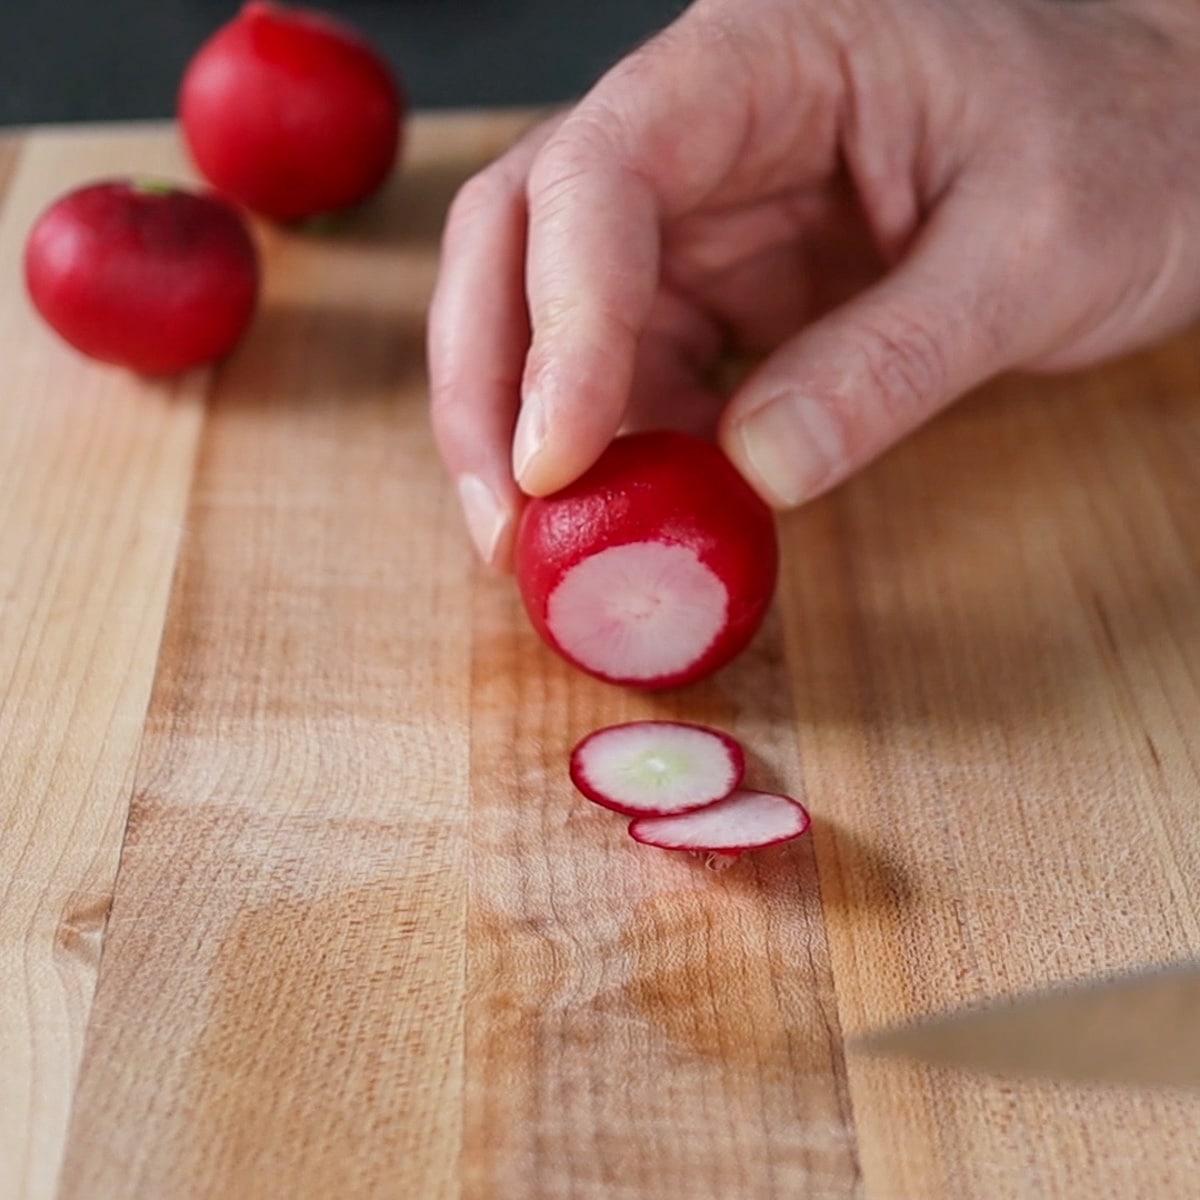 end of radish cut-off